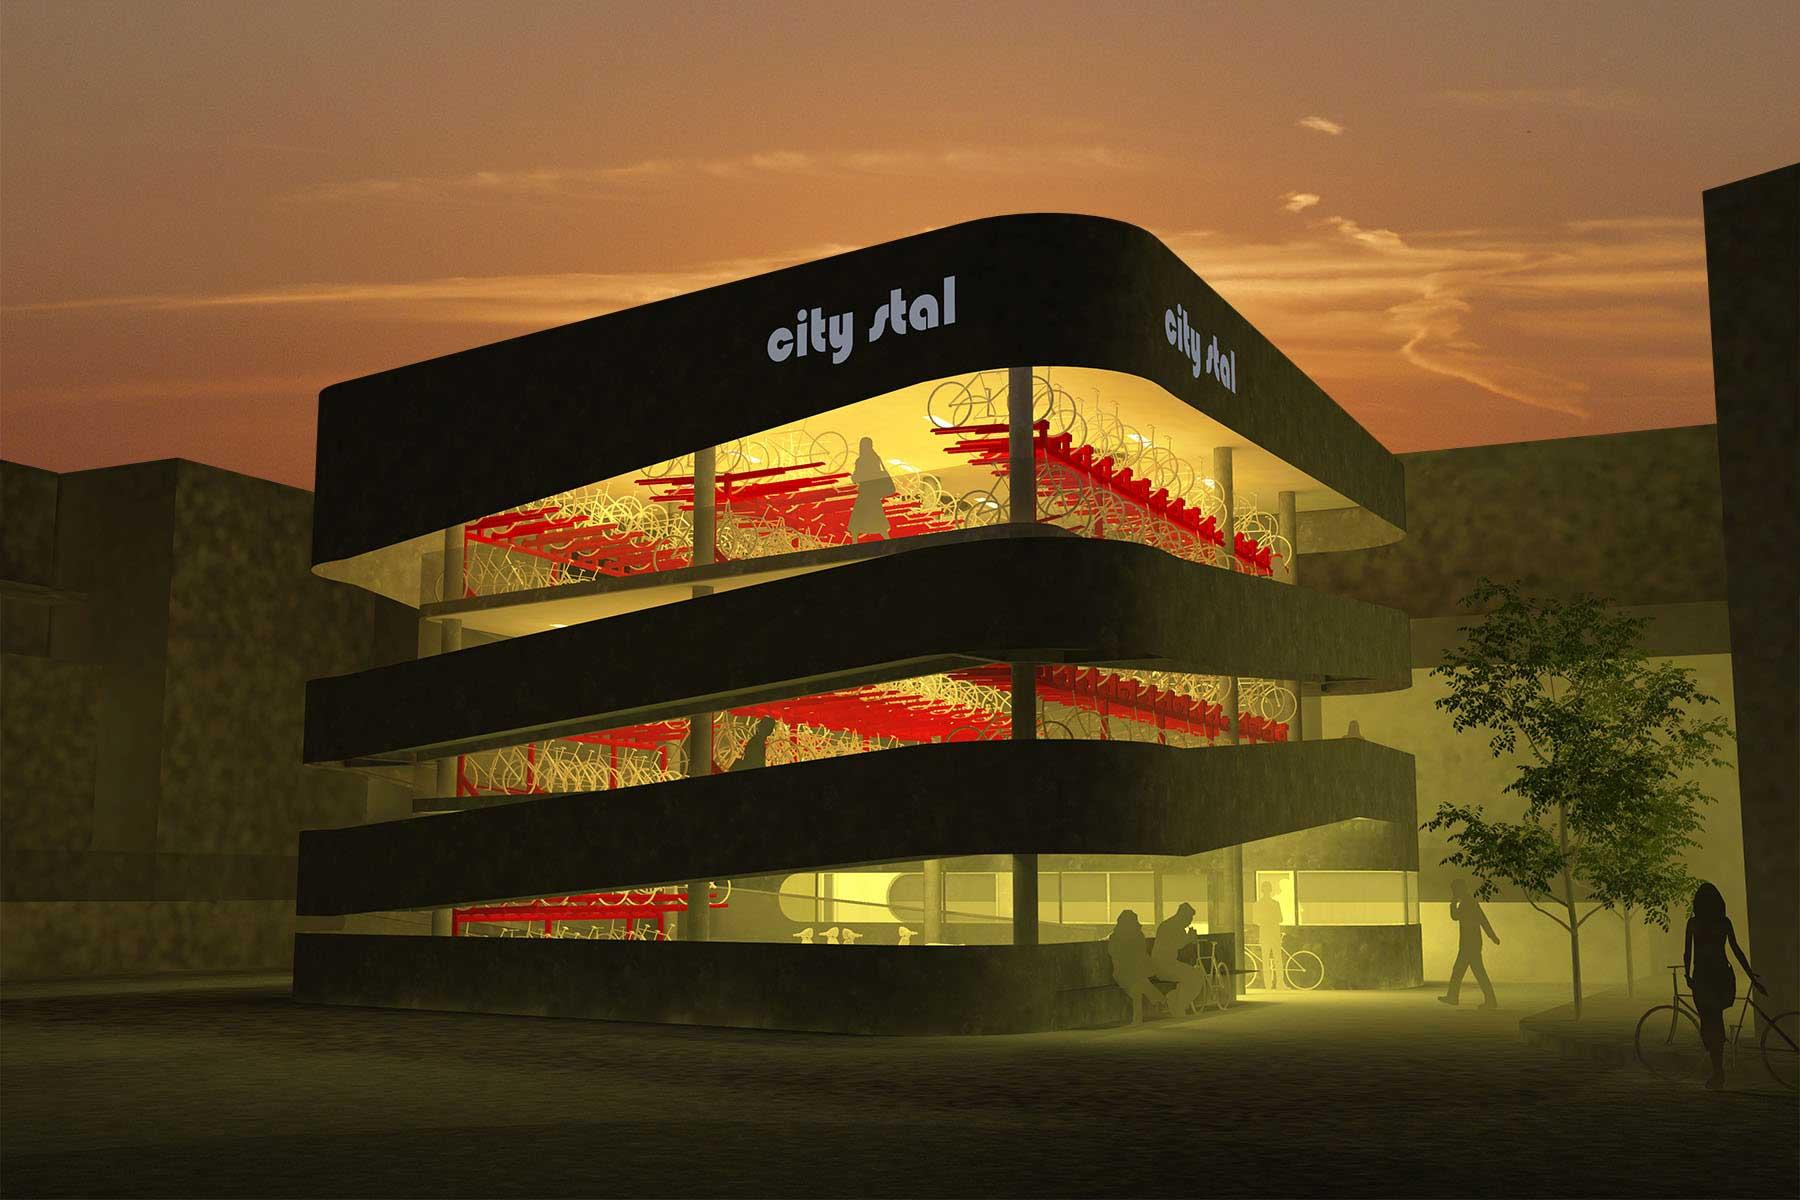 8A-Architecten-city-stal-nieuwegein-02